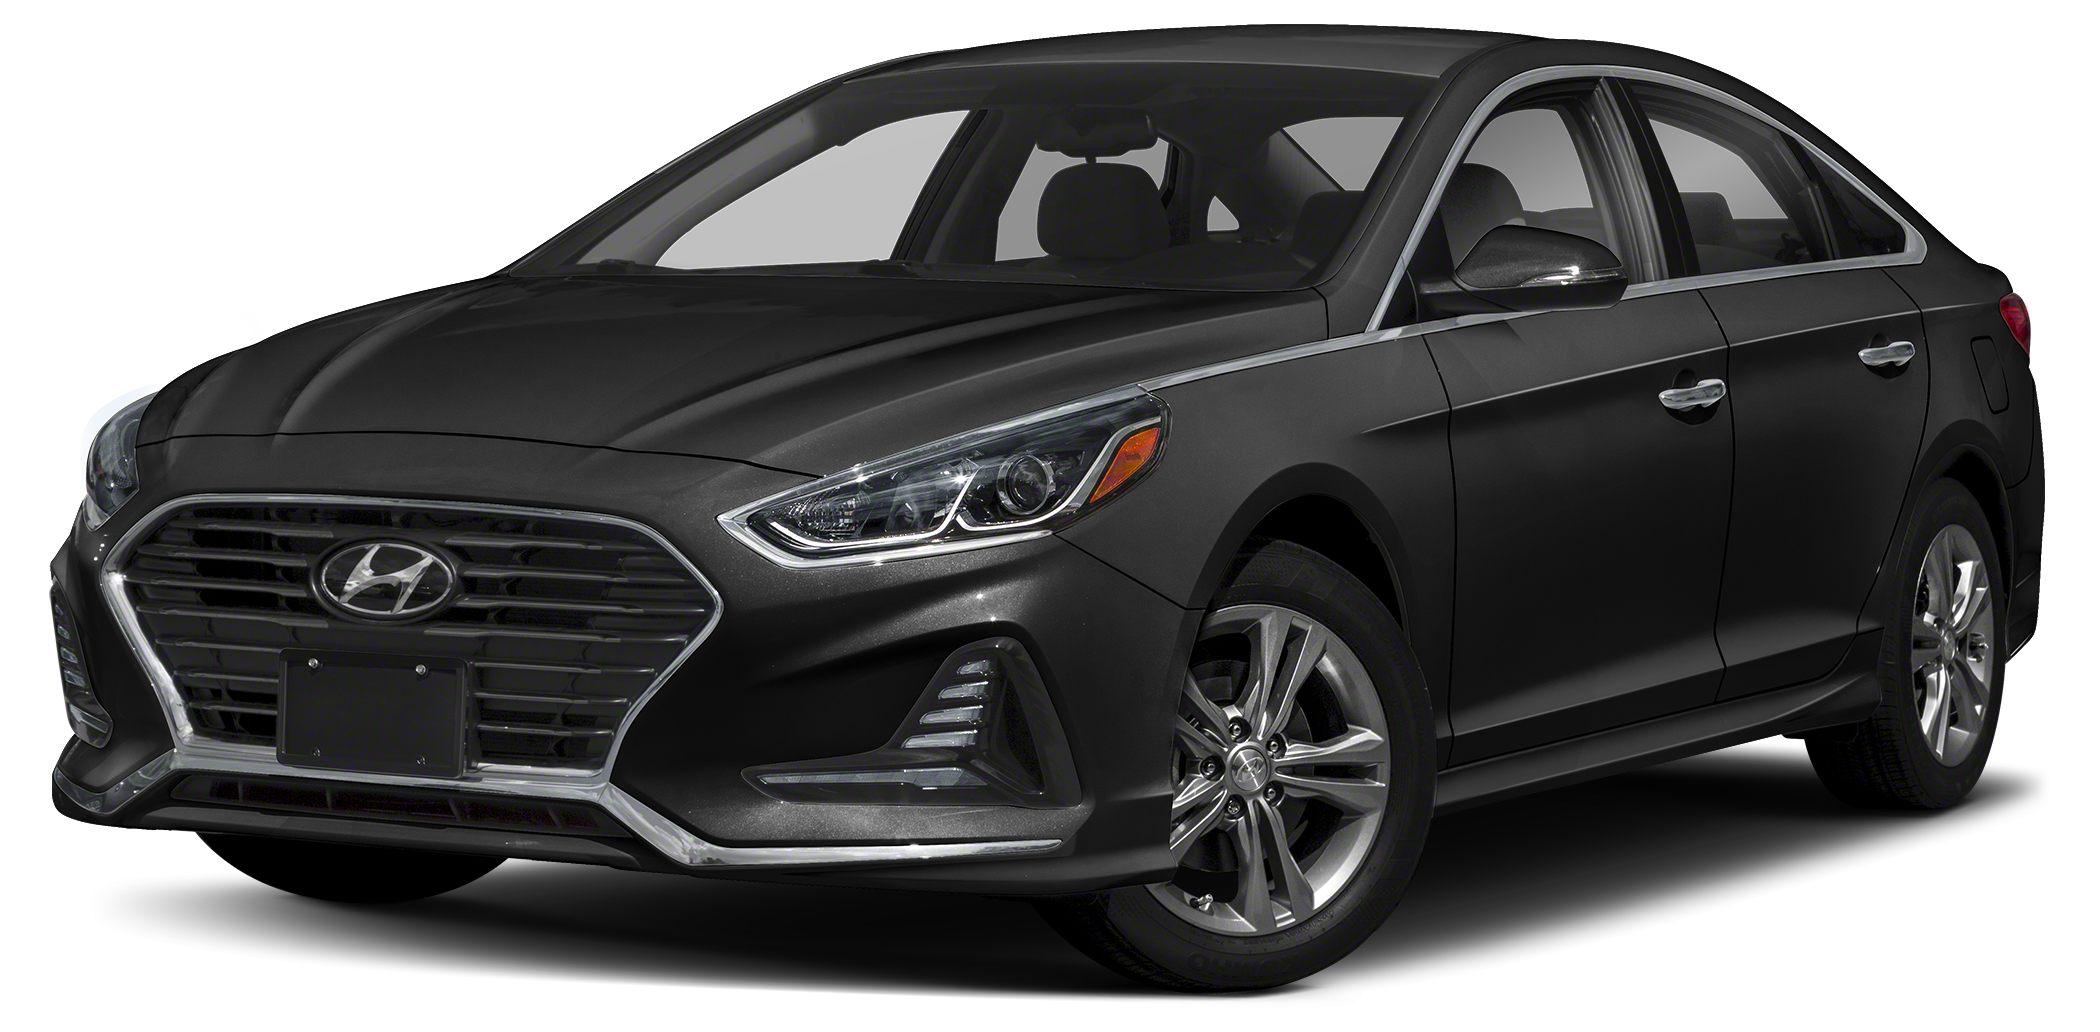 2018 Hyundai Sonata SEL Bluetooth Miles 10Color Phantom Black Stock 15571 VIN 5NPE34AF8JH64